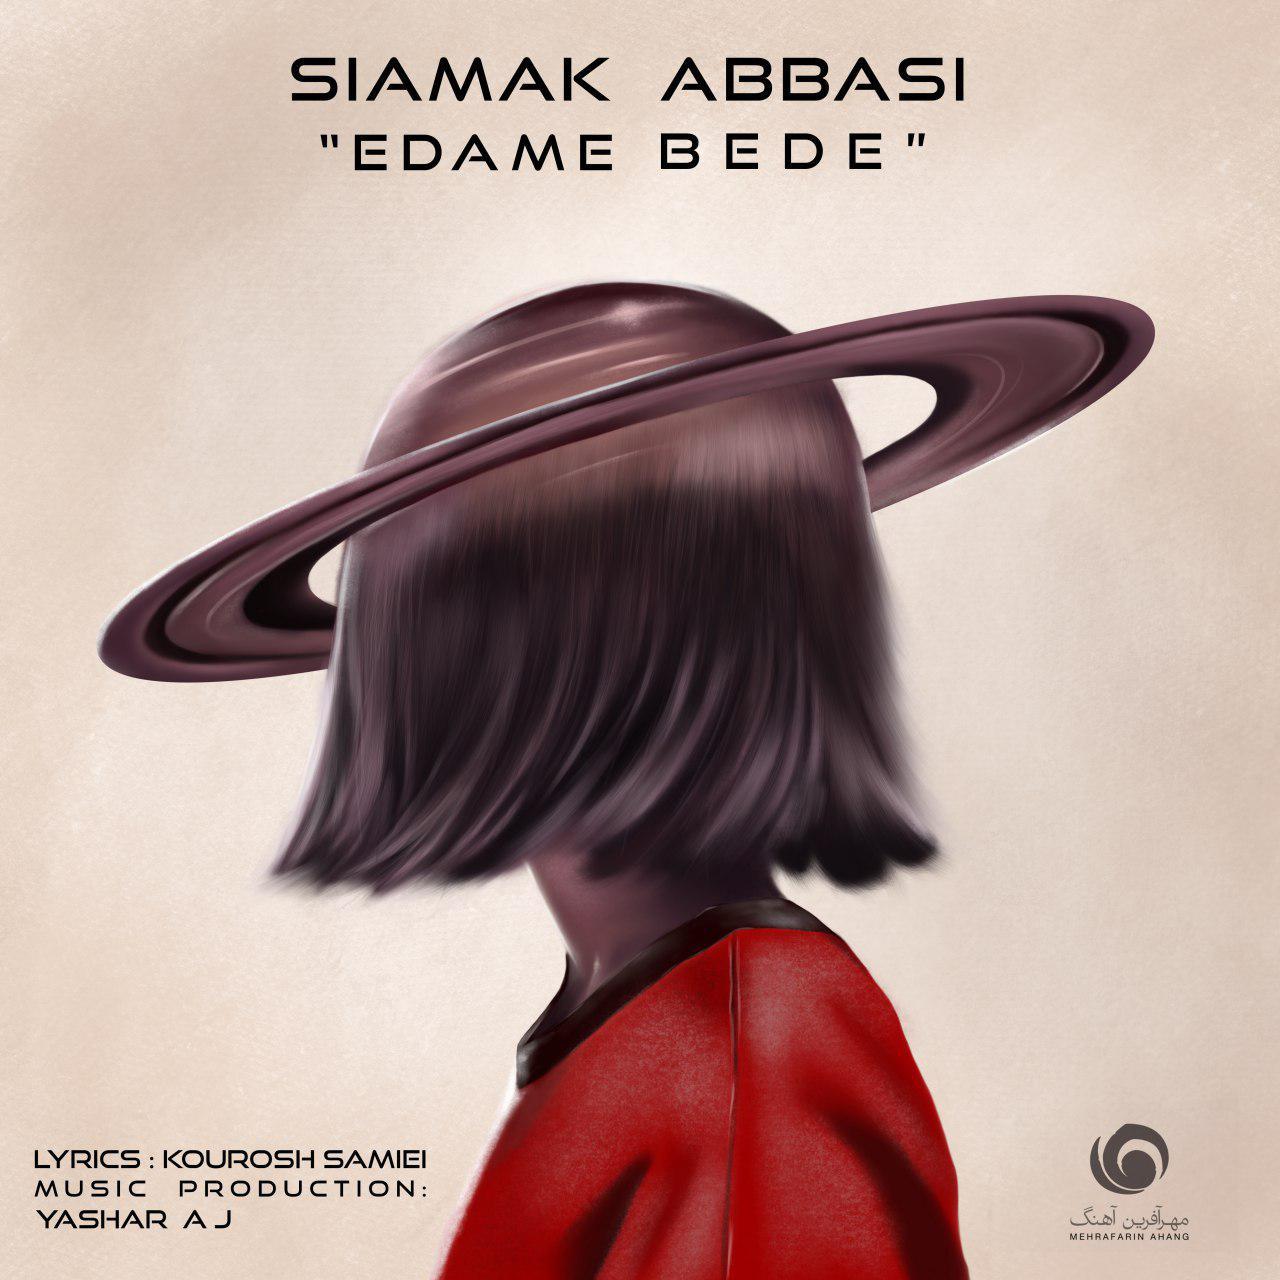 Siamak Abbasi – Edame Bede